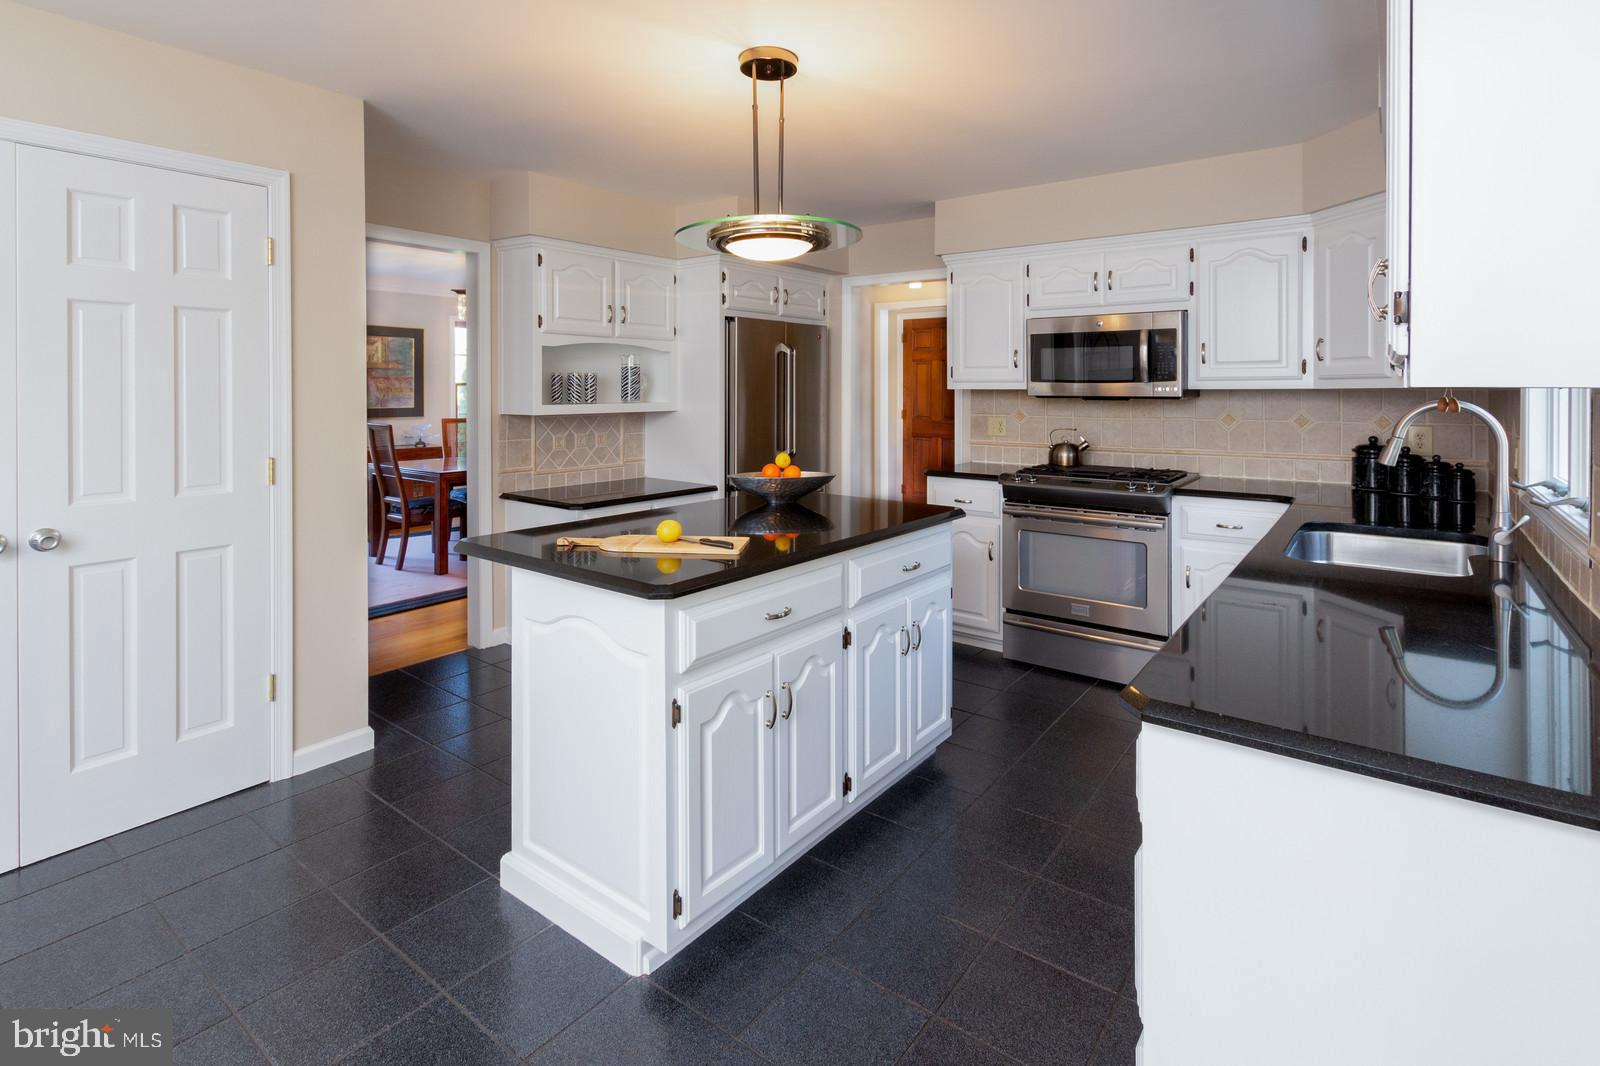 Bright White Kitchen w/ Stainless Steel Appliances